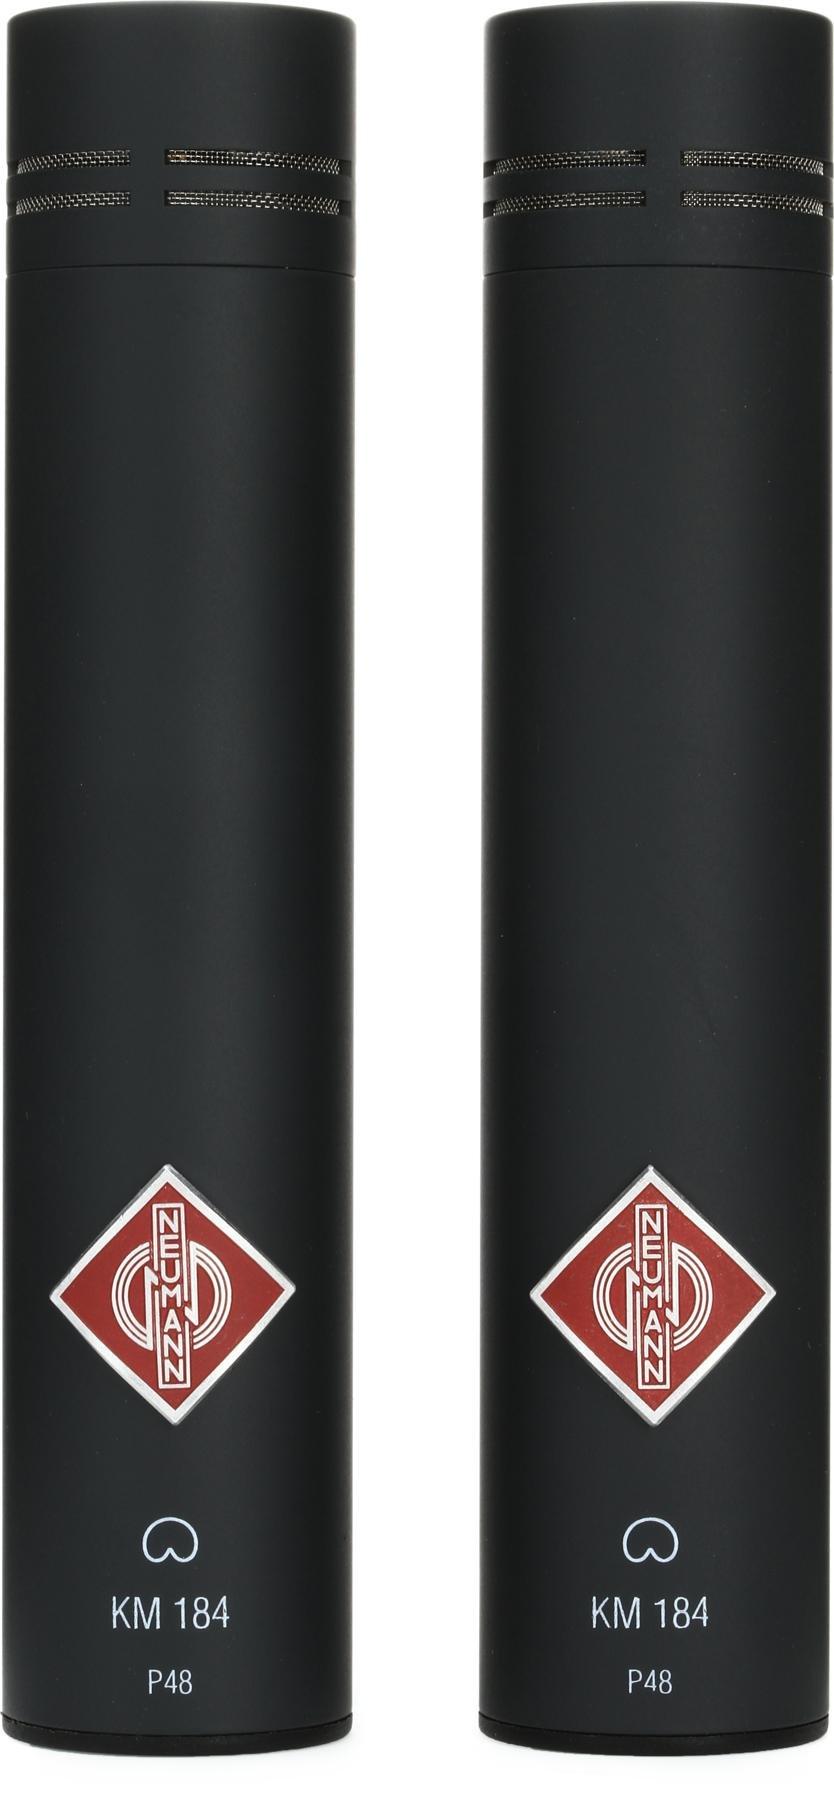 Neumann KM 184 Stereo Set Small-diaphragm Cardioid Microphones - Matte  Black image 1